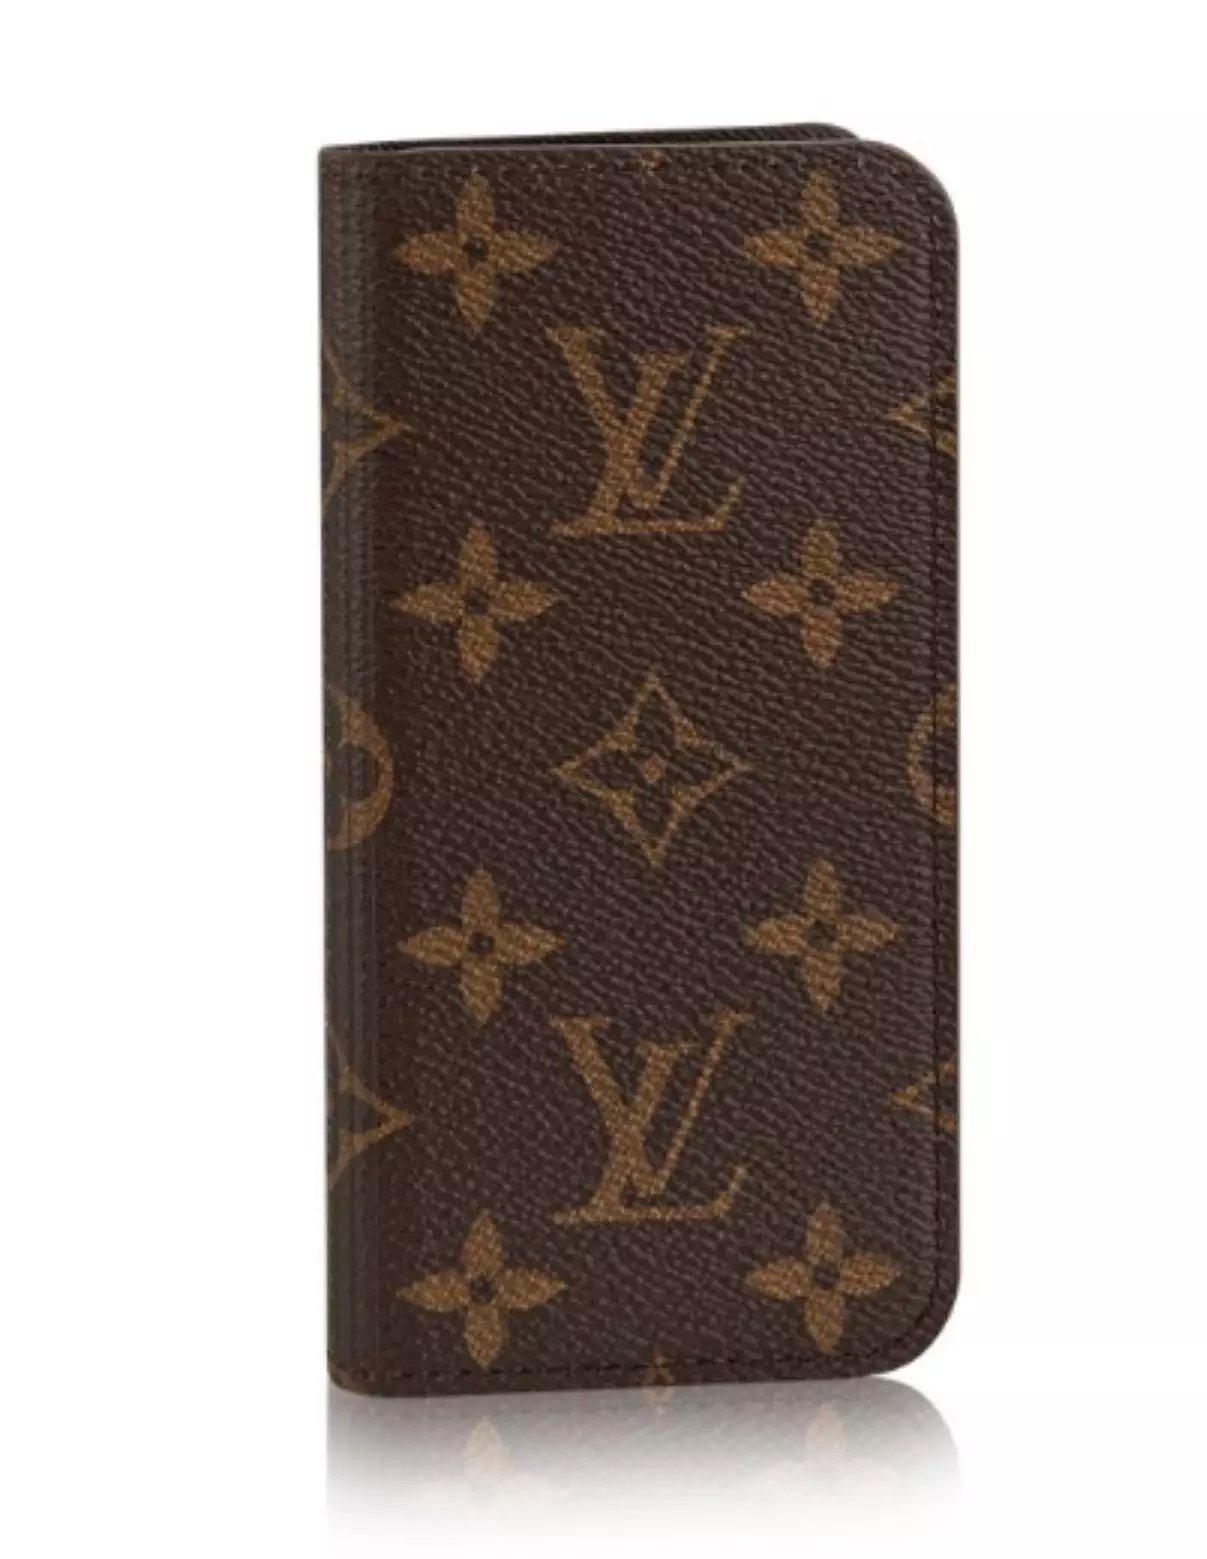 iphone hülle selber gestalten günstig iphone case bedrucken Louis Vuitton iphone6s hülle iphone 6s hülle galaxy handyhülle iphone s6s preis von iphone 6 hülle iphone 6s leder handy hardcover 6slbst gestalten s6s hülle 6slbst gestalten